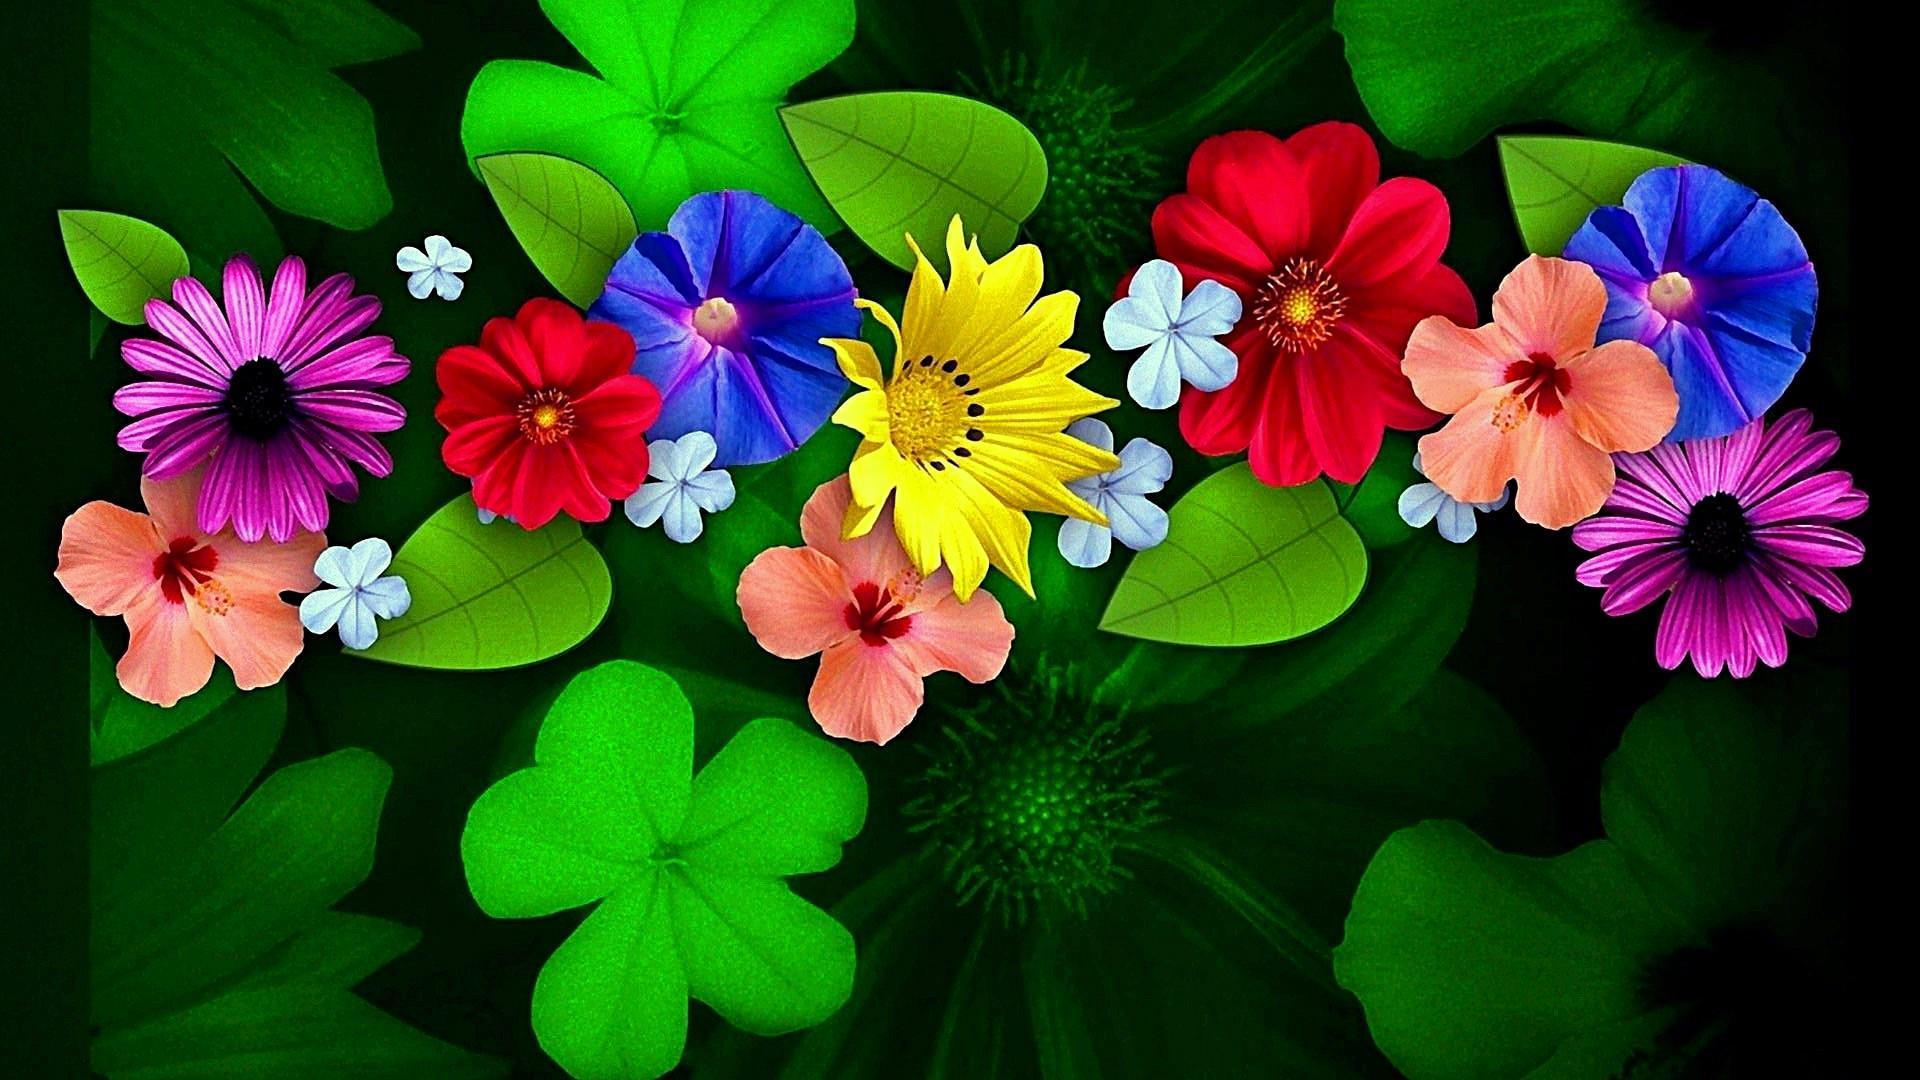 21+ Flower Wallpaper Hd Images Images